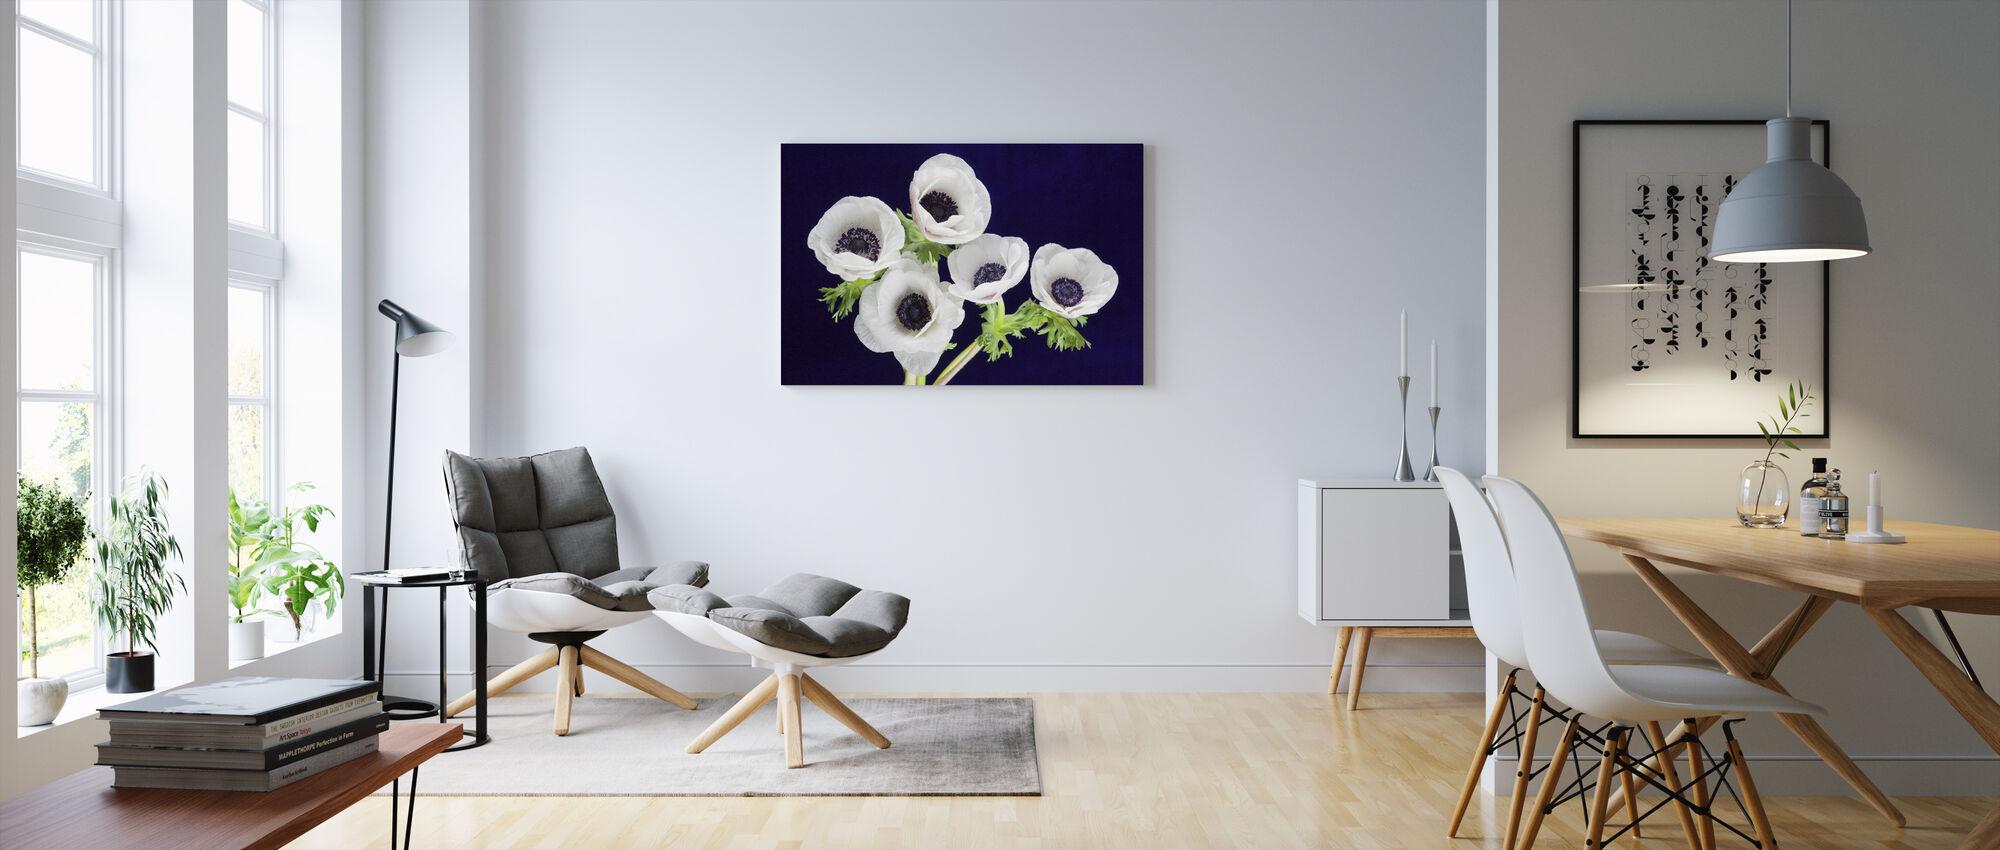 Flower Blooms - Canvas print - Living Room